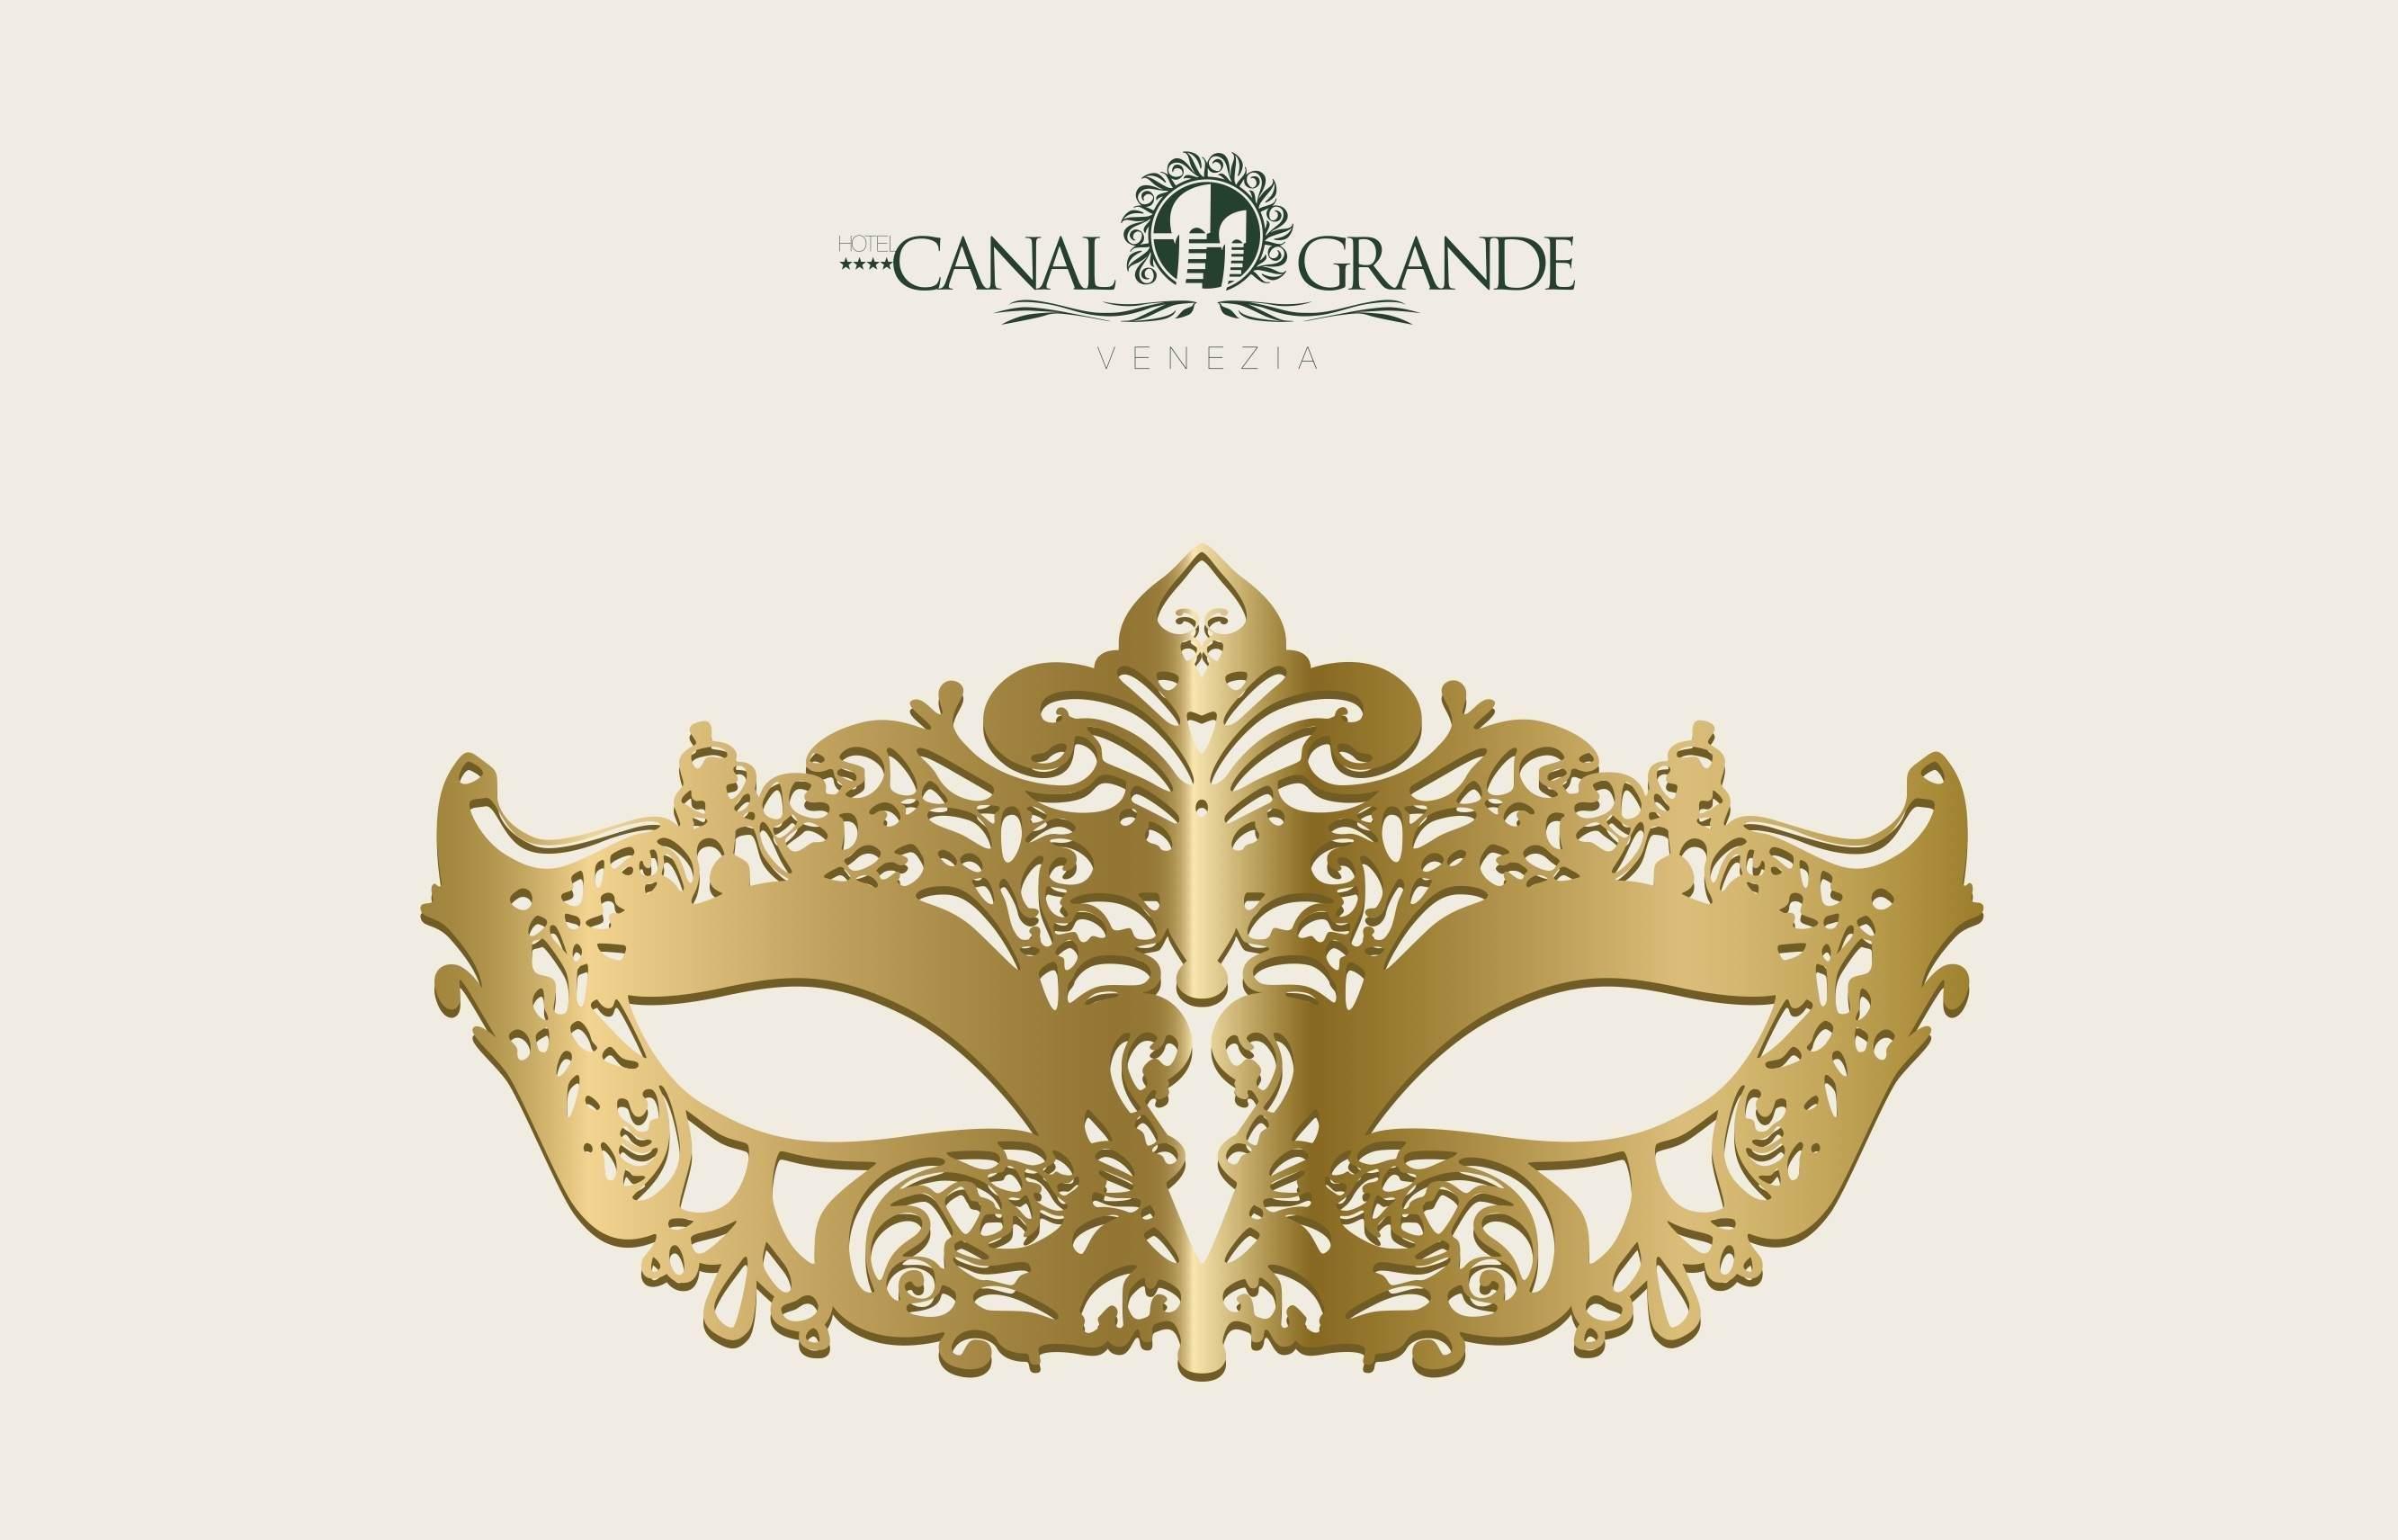 Venice Carnival 2020 - Hotel Canal Grande